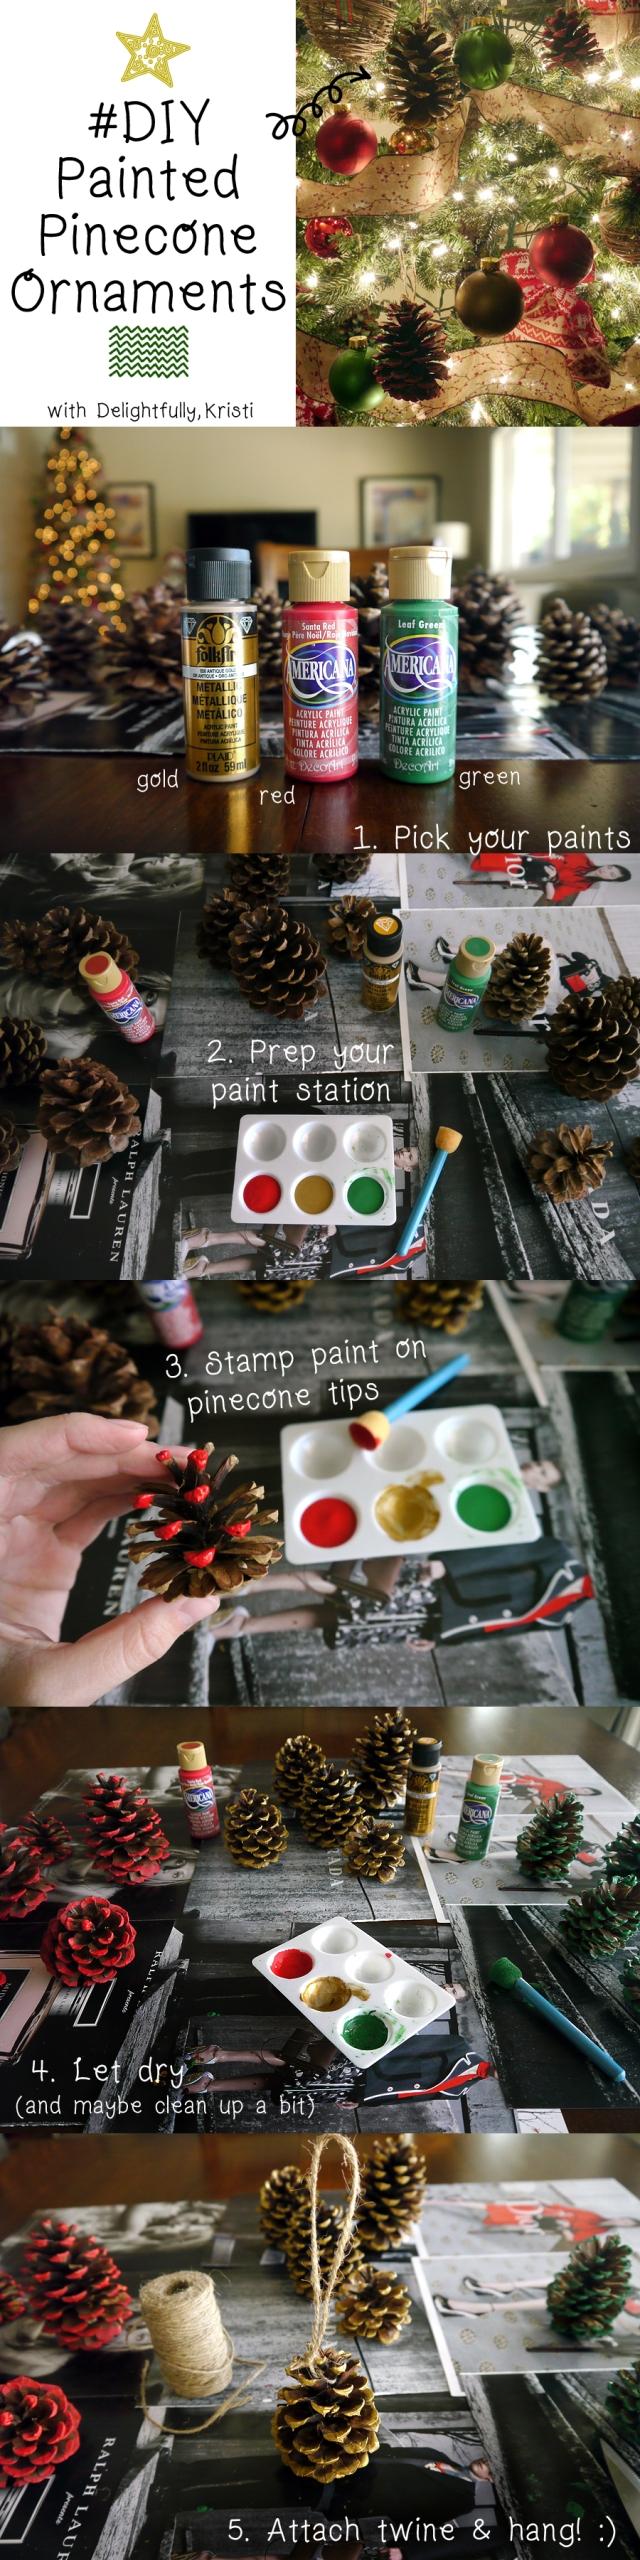 #DIY-pinecone-ornament-infographic-2